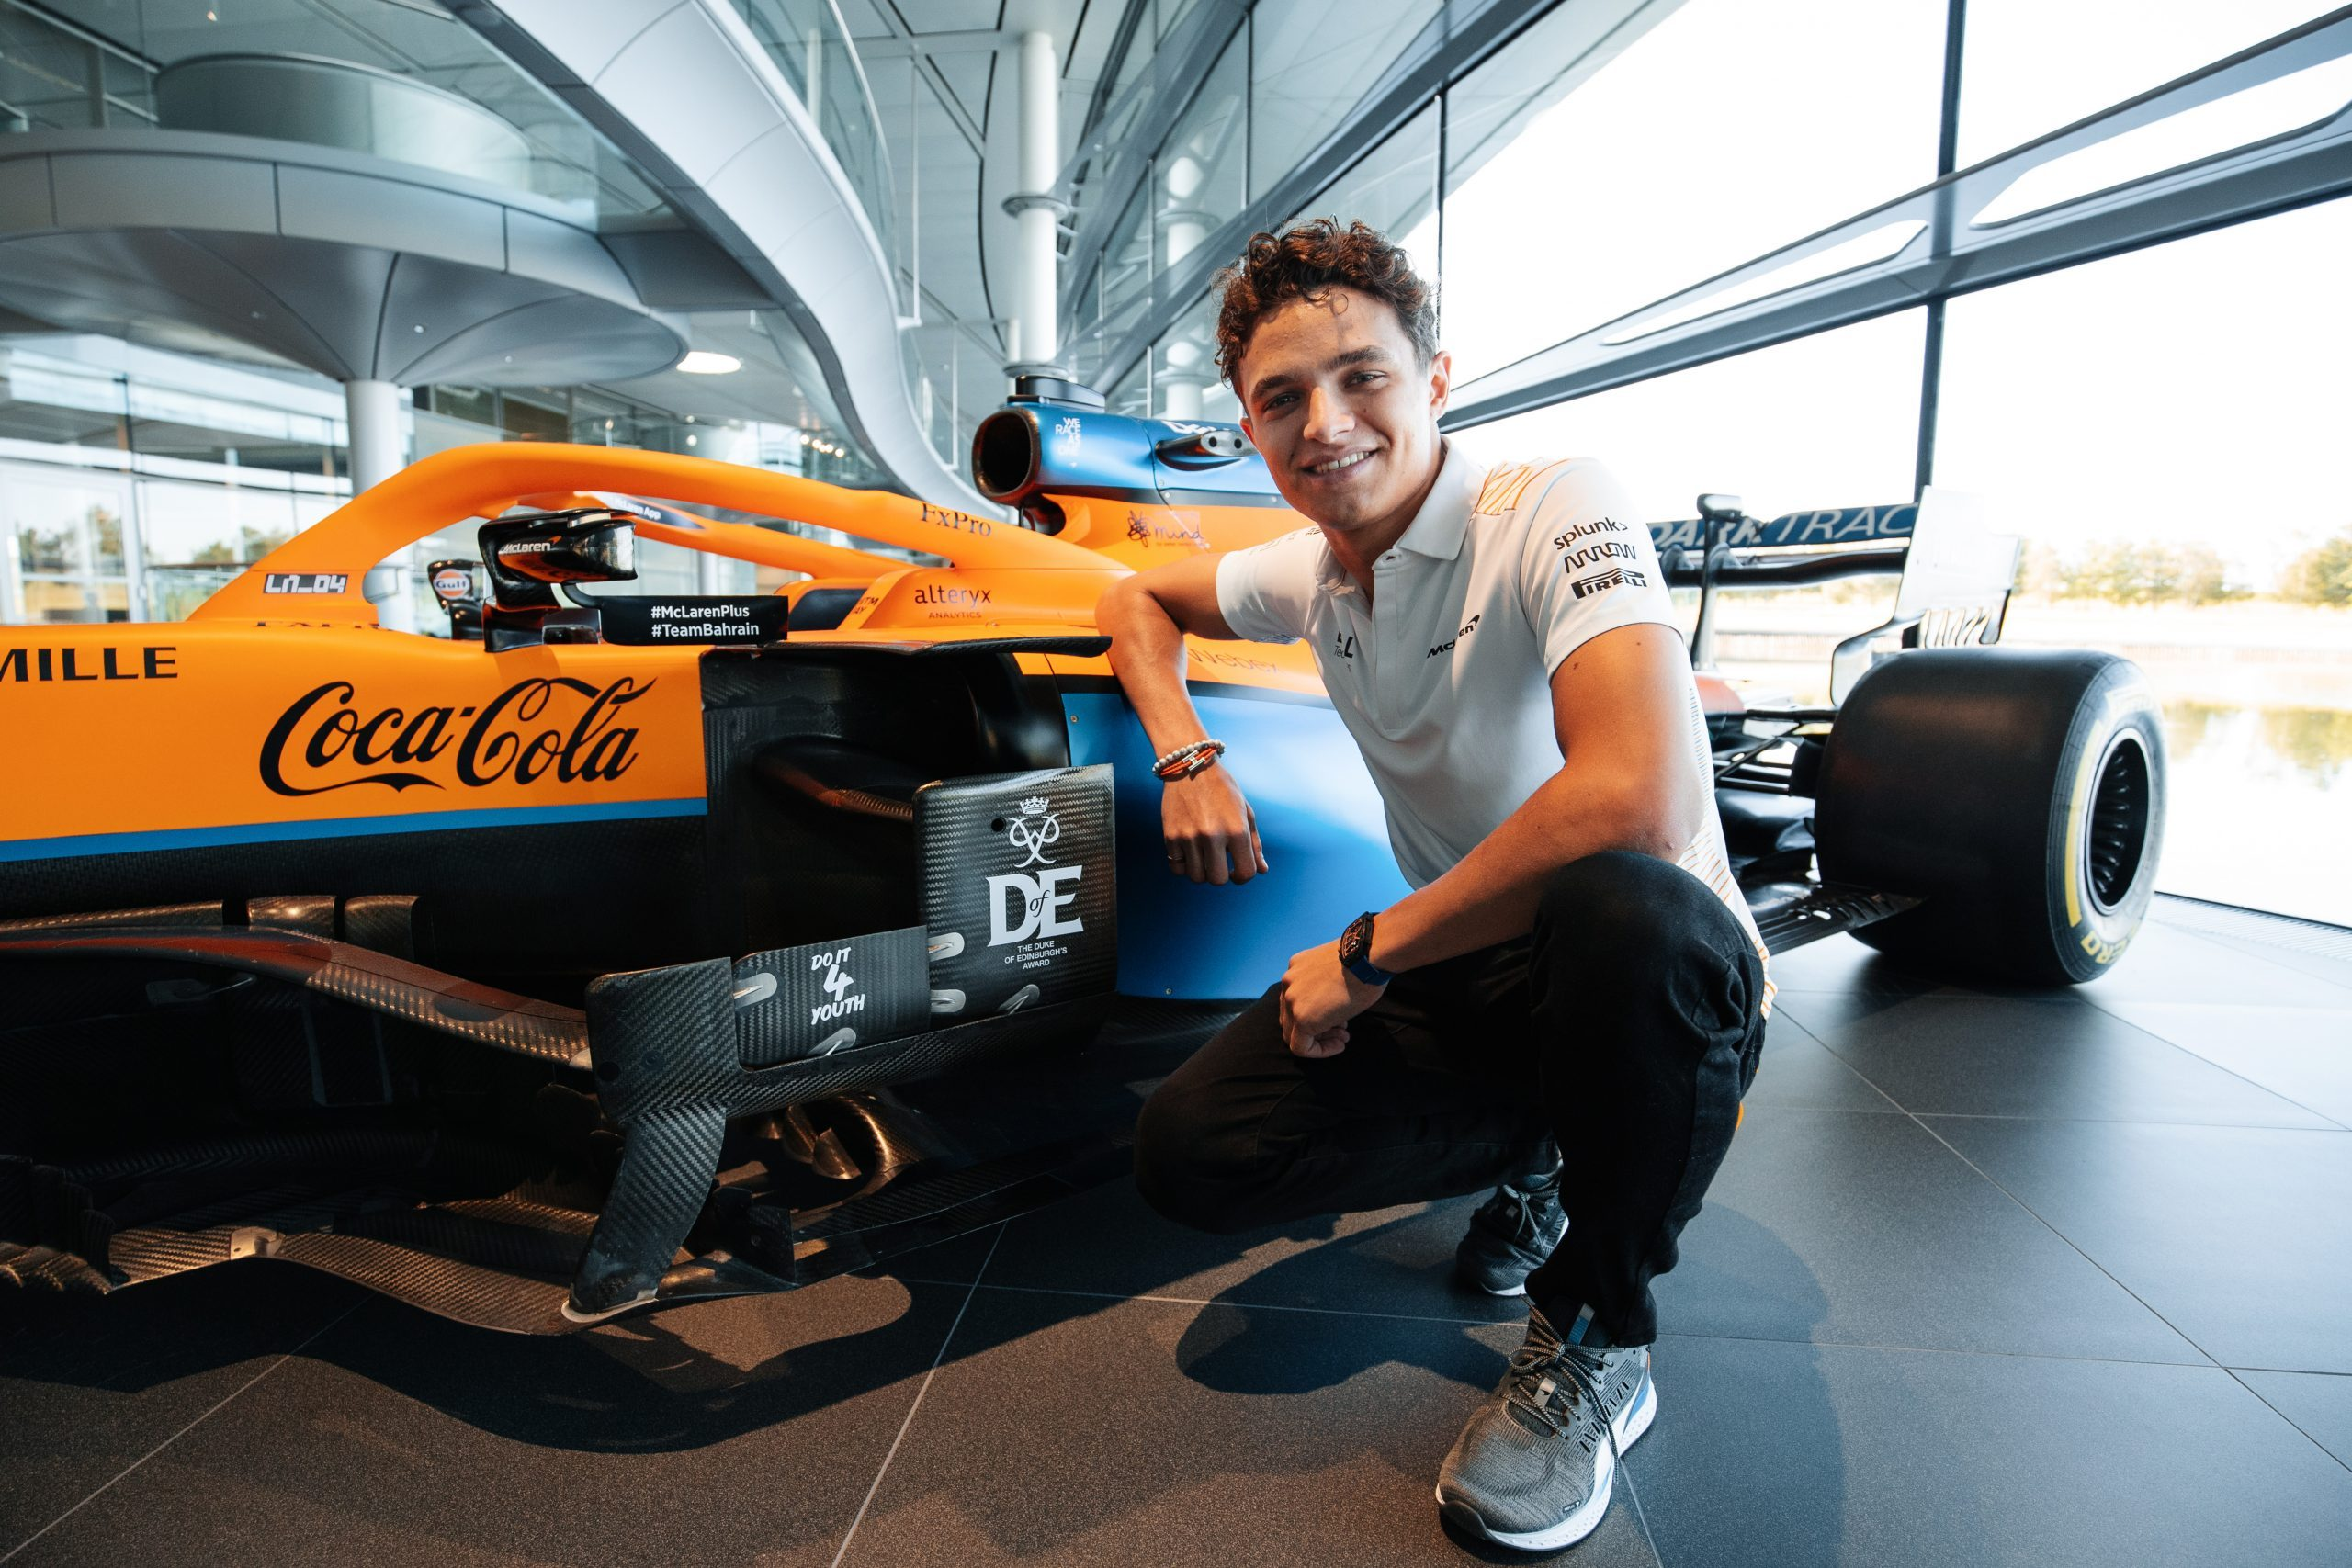 Lando Norris, McLaren car